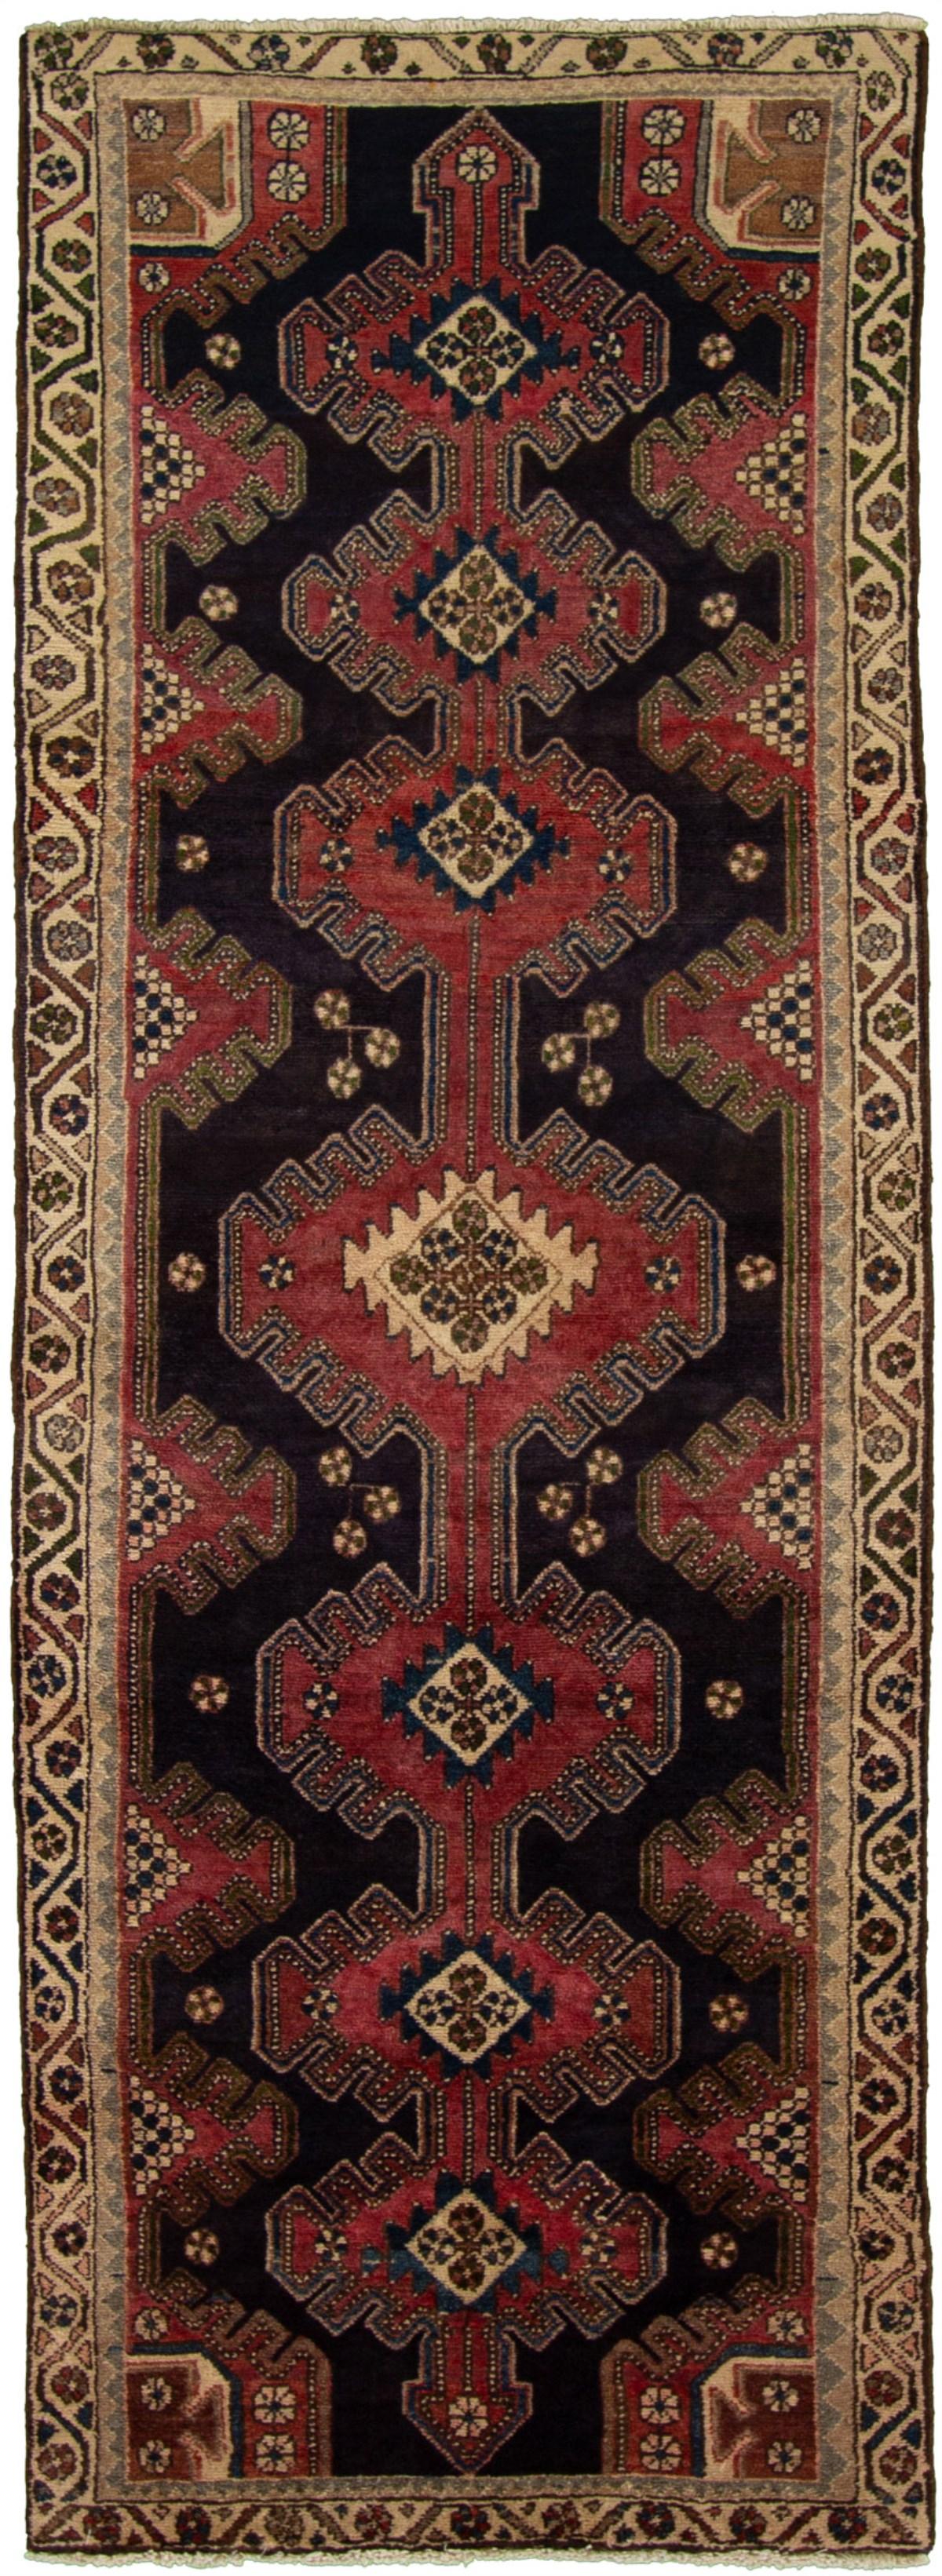 "Hand-knotted Hamadan Dark Navy, Red Wool Rug 3'2"" x 9'3"" Size: 3'2"" x 9'3"""